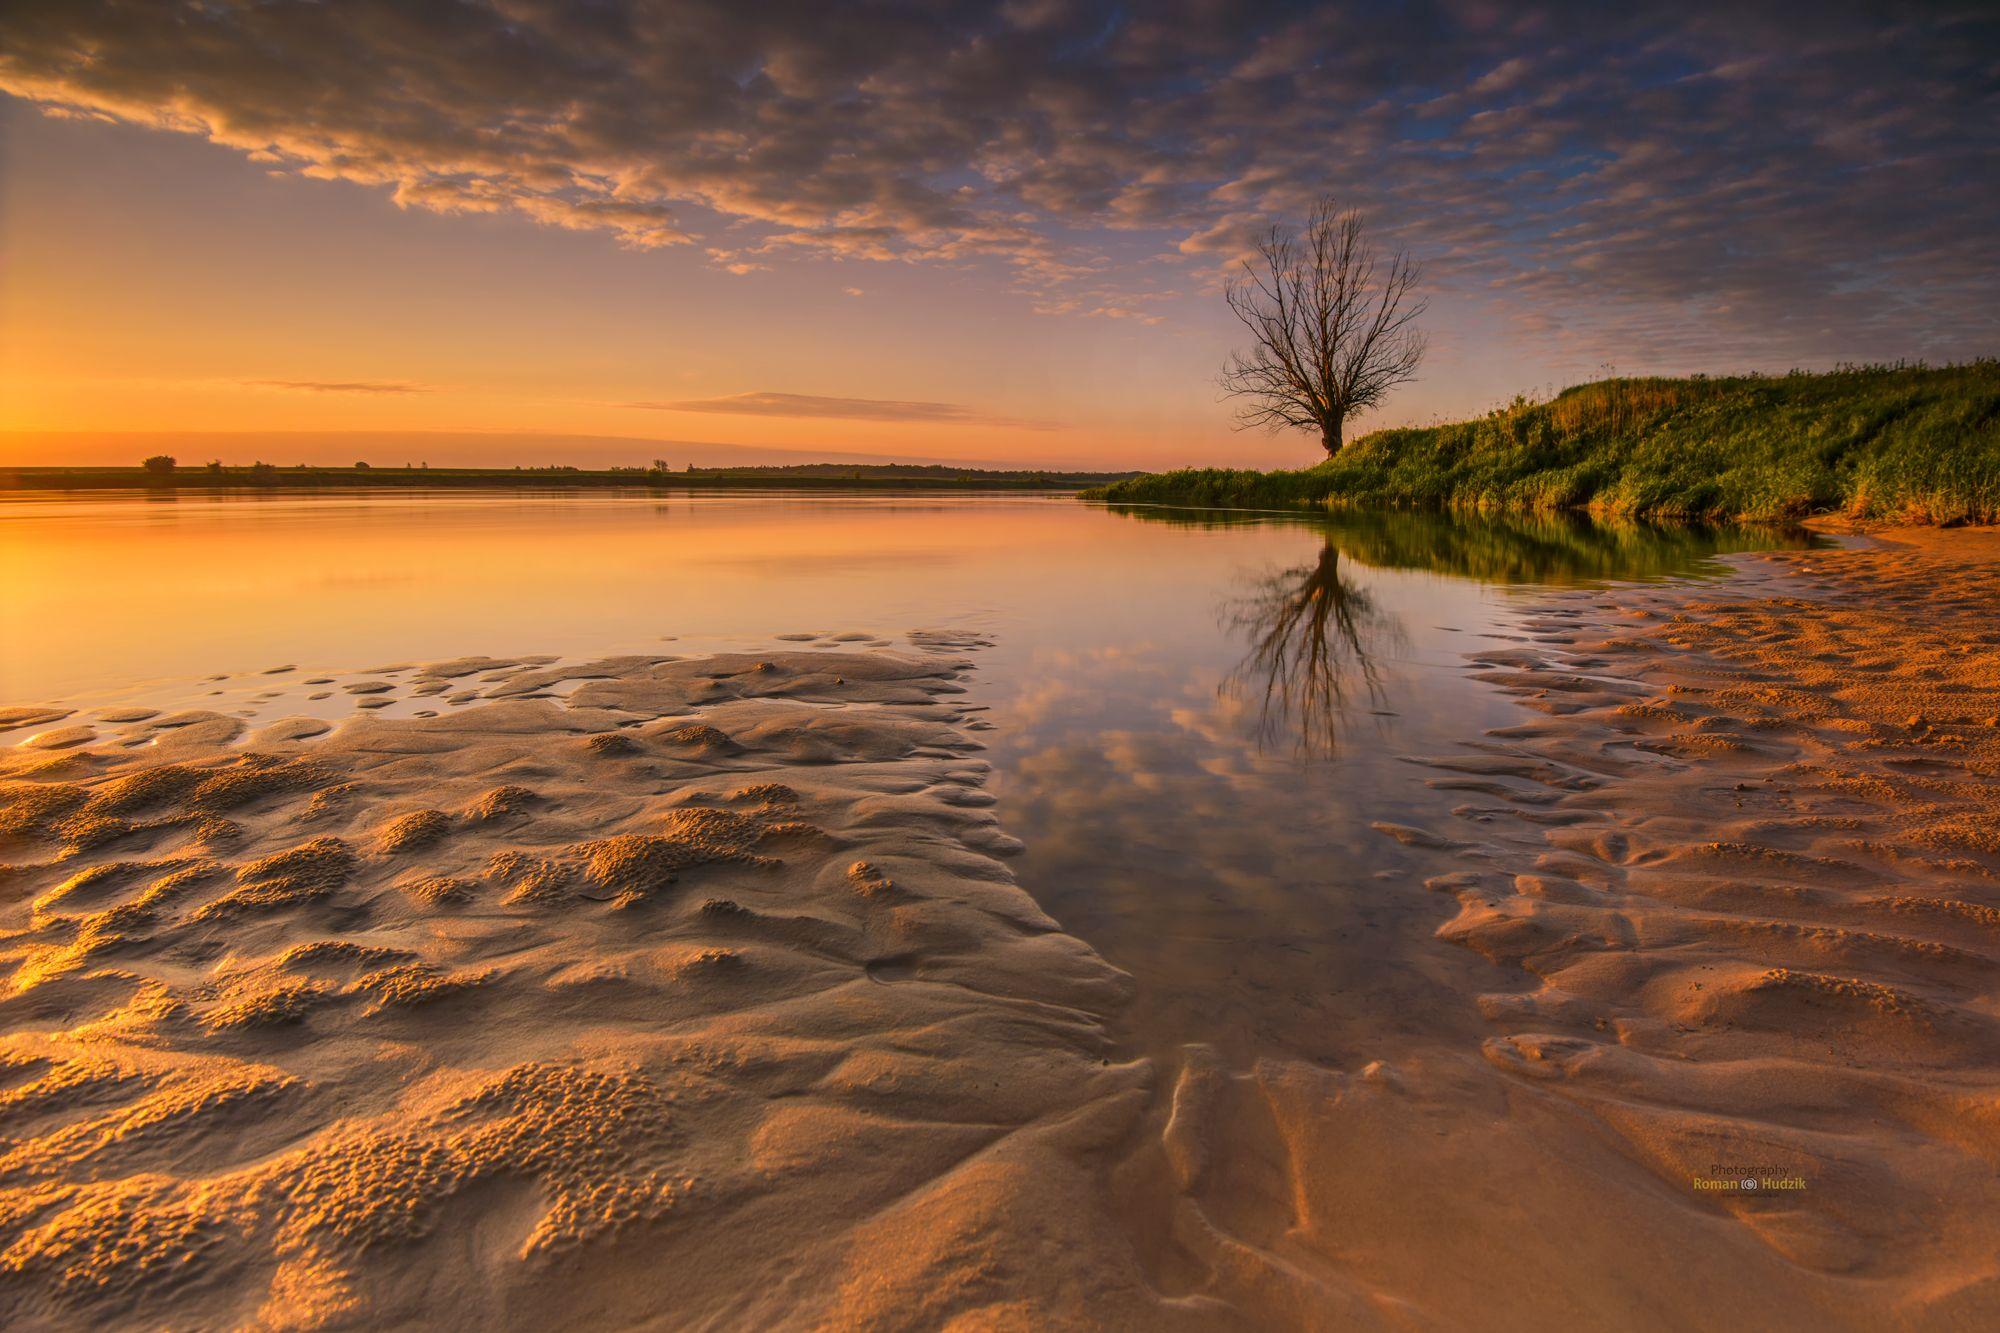 river, sunrise, lonely tree, sand, sky, clouds, landscape, Hudzik Roman